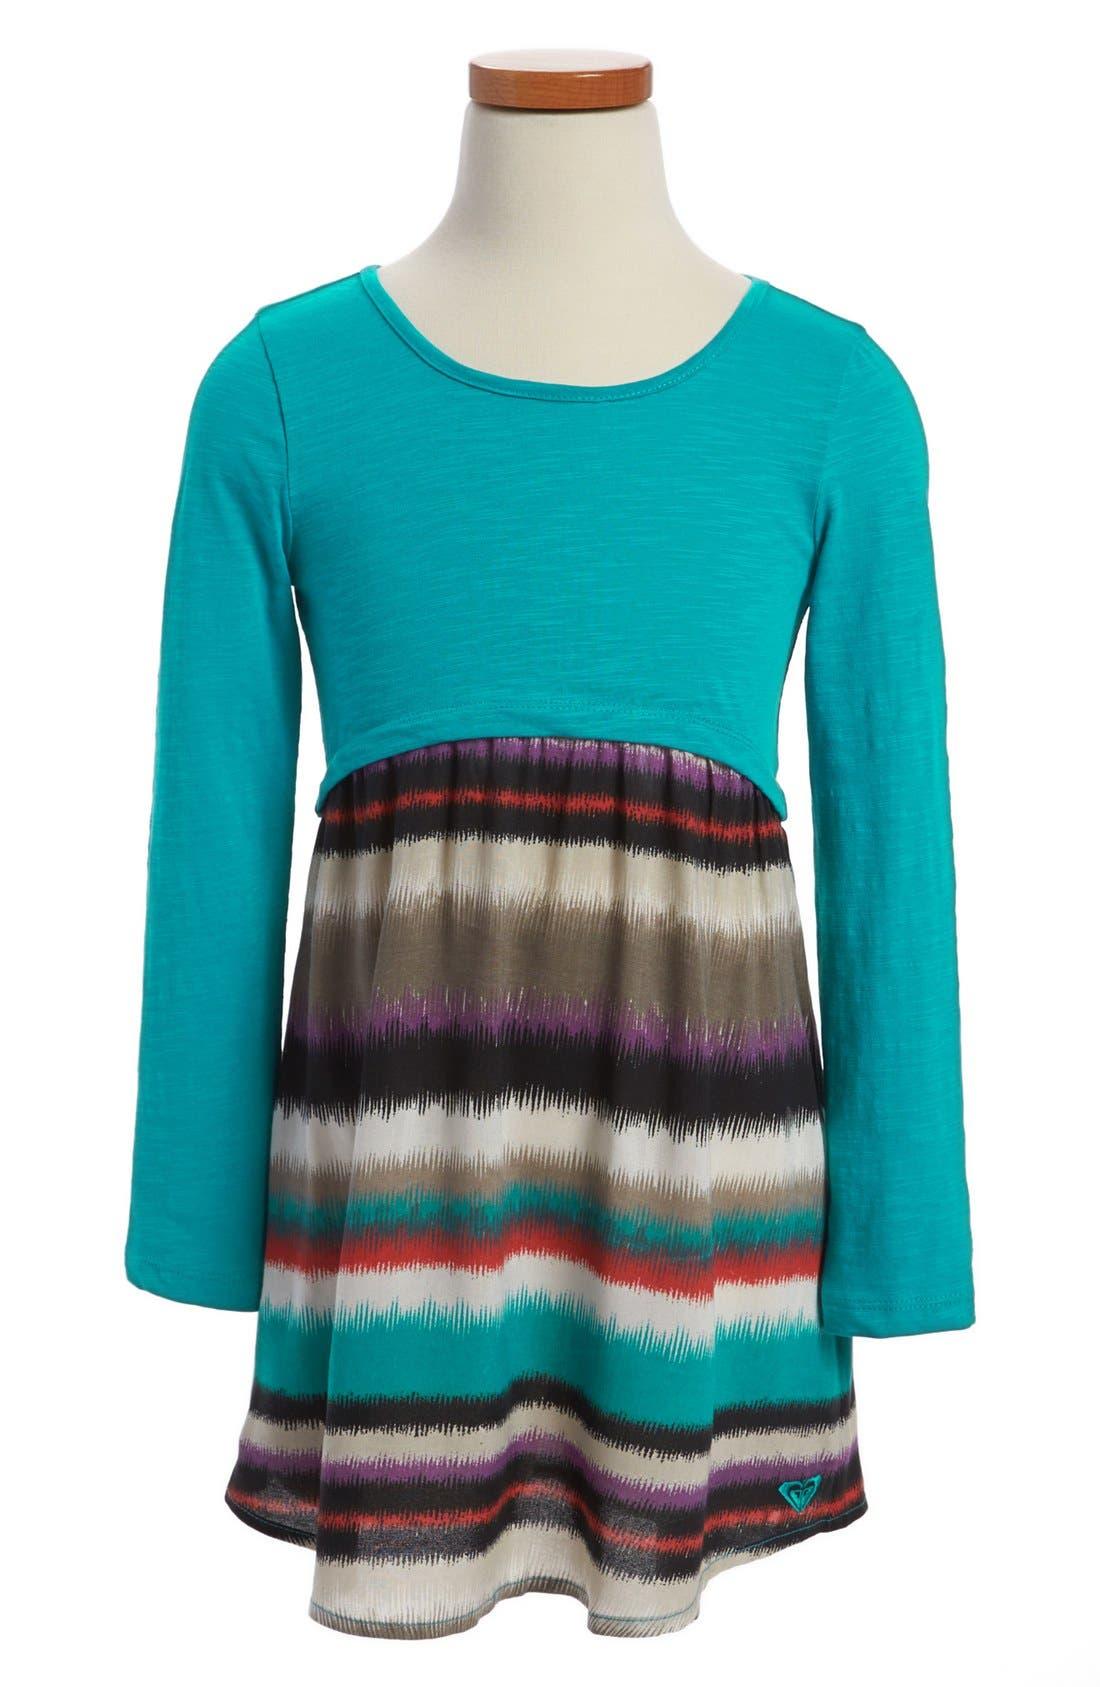 Alternate Image 1 Selected - Roxy 'Sand Stone' Knit Dress (Little Girls)